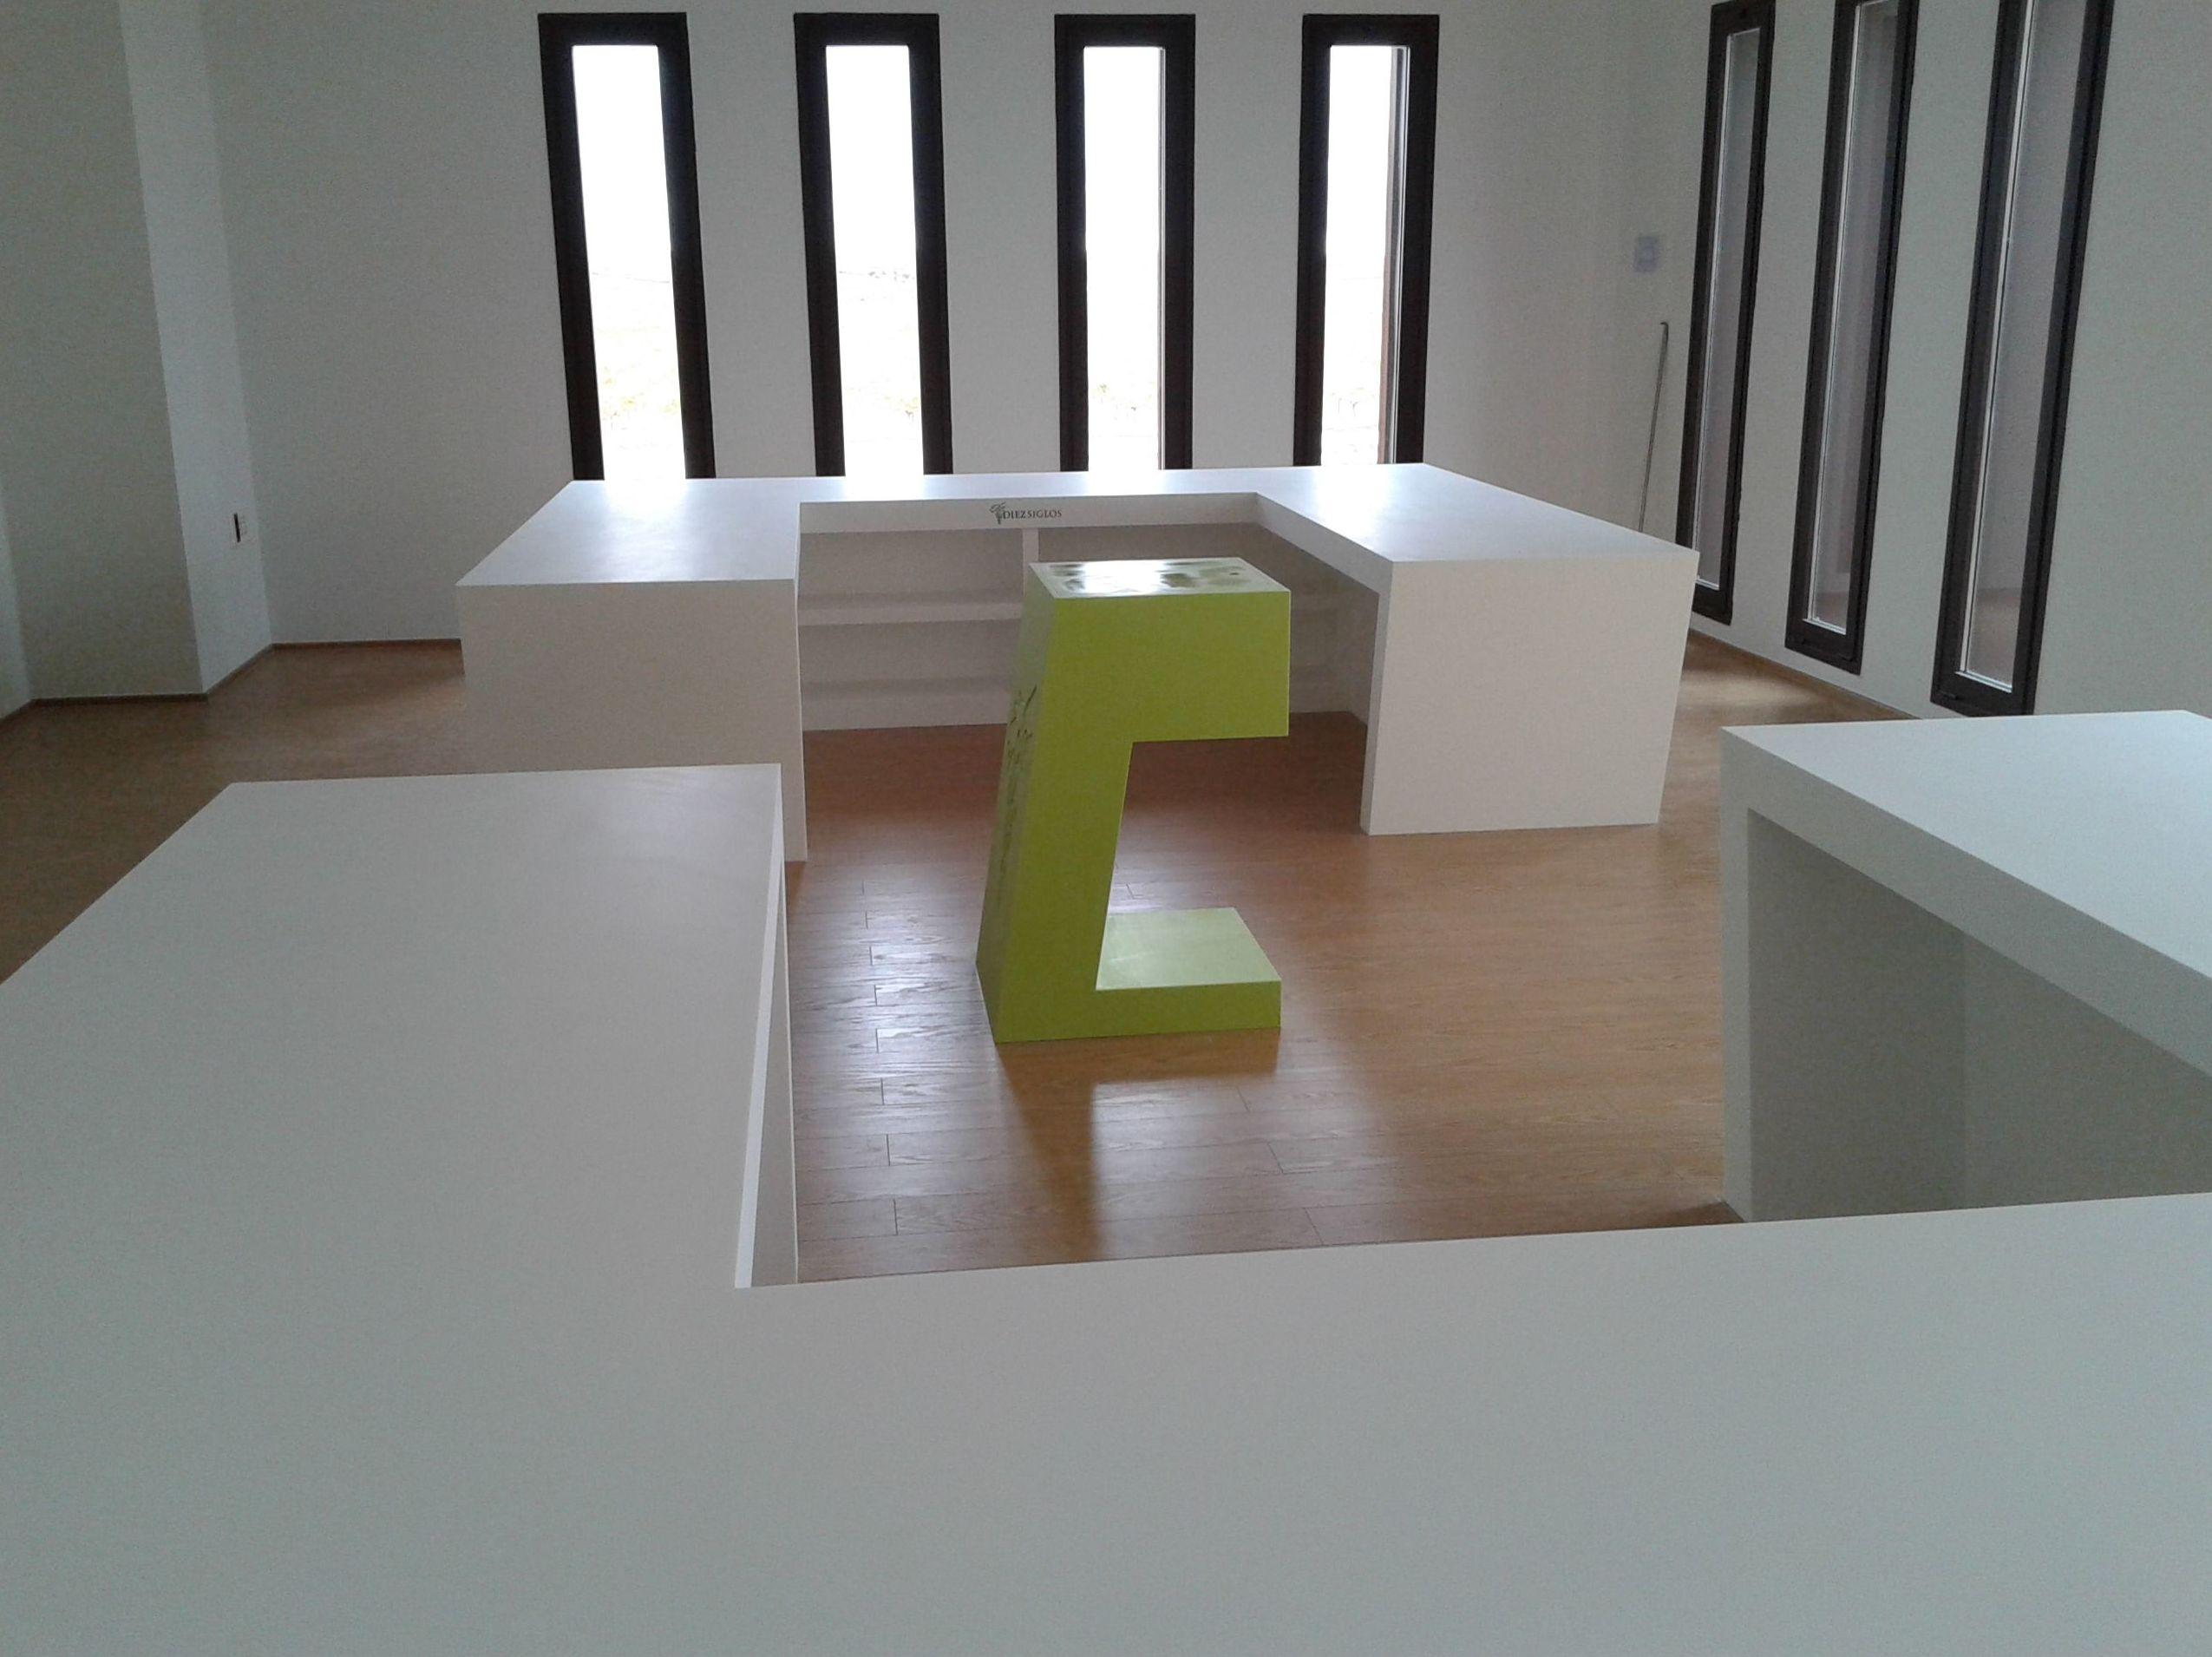 Foto 37 de Fabricantes de Krion en Zamora | Werke Design